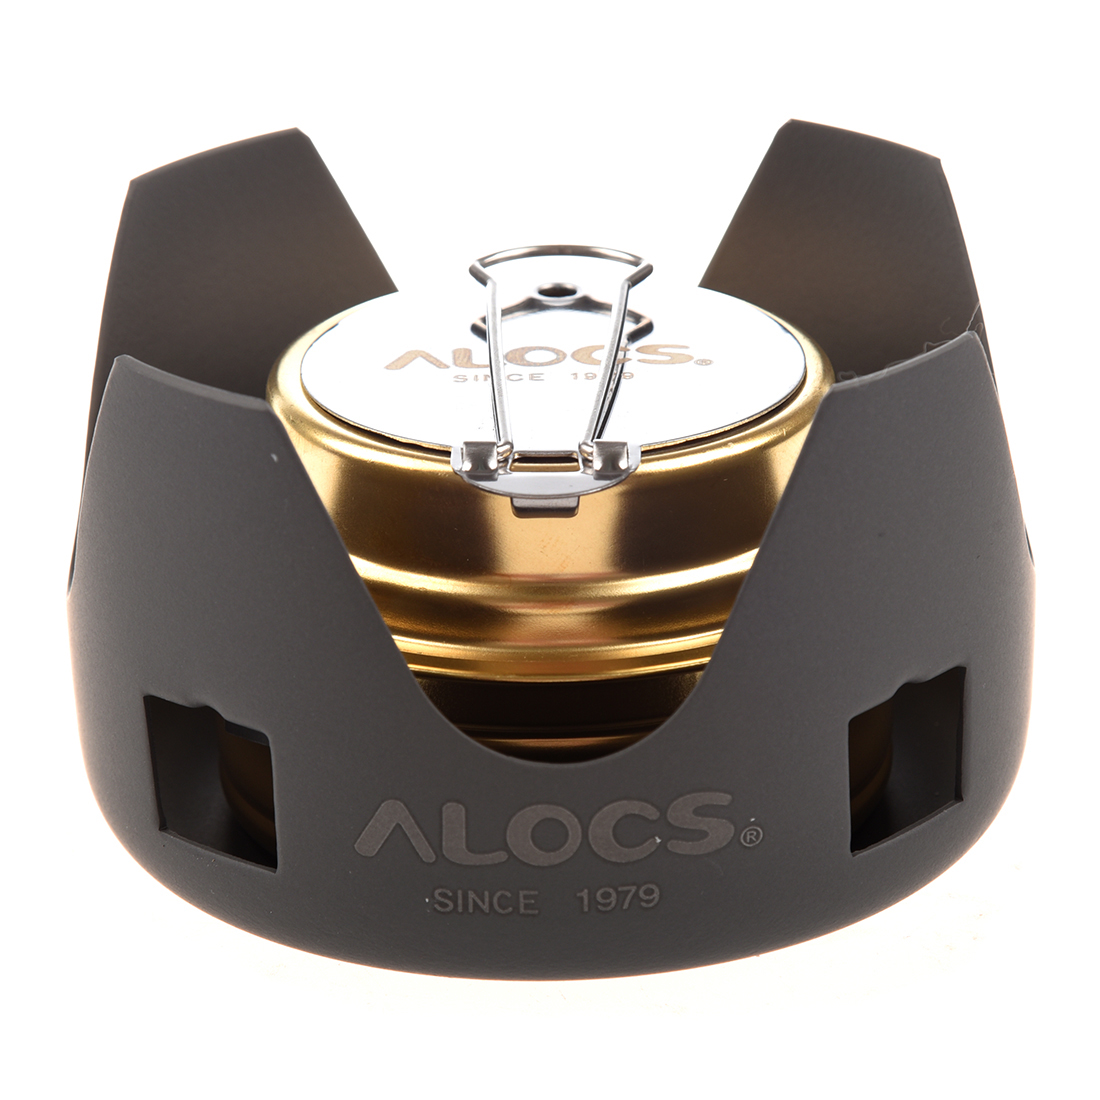 Light Stand Takara Spirit 3: Super Sell ALOCS Portable Mini Ultra Light Spirit Alcohol